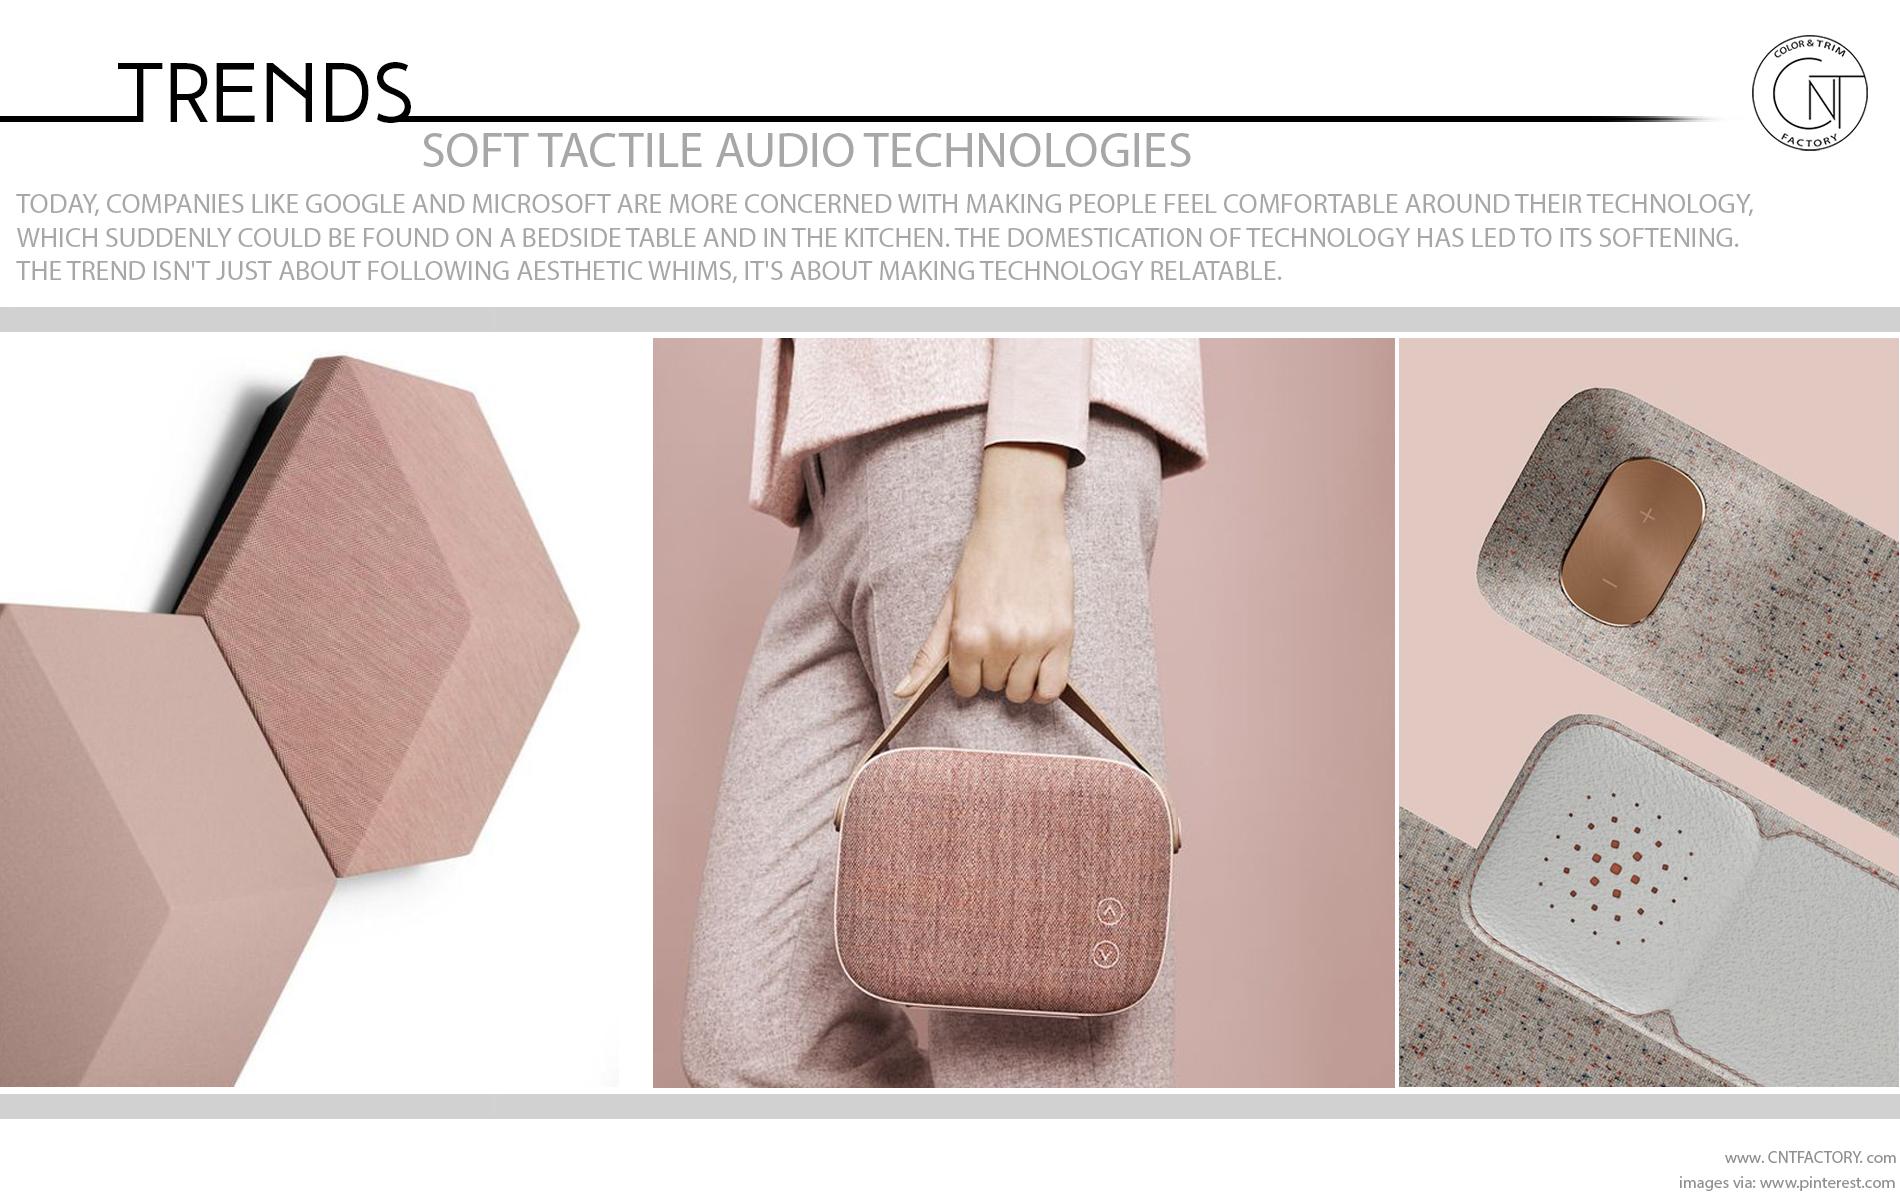 Soft Tactile Audio Technologies